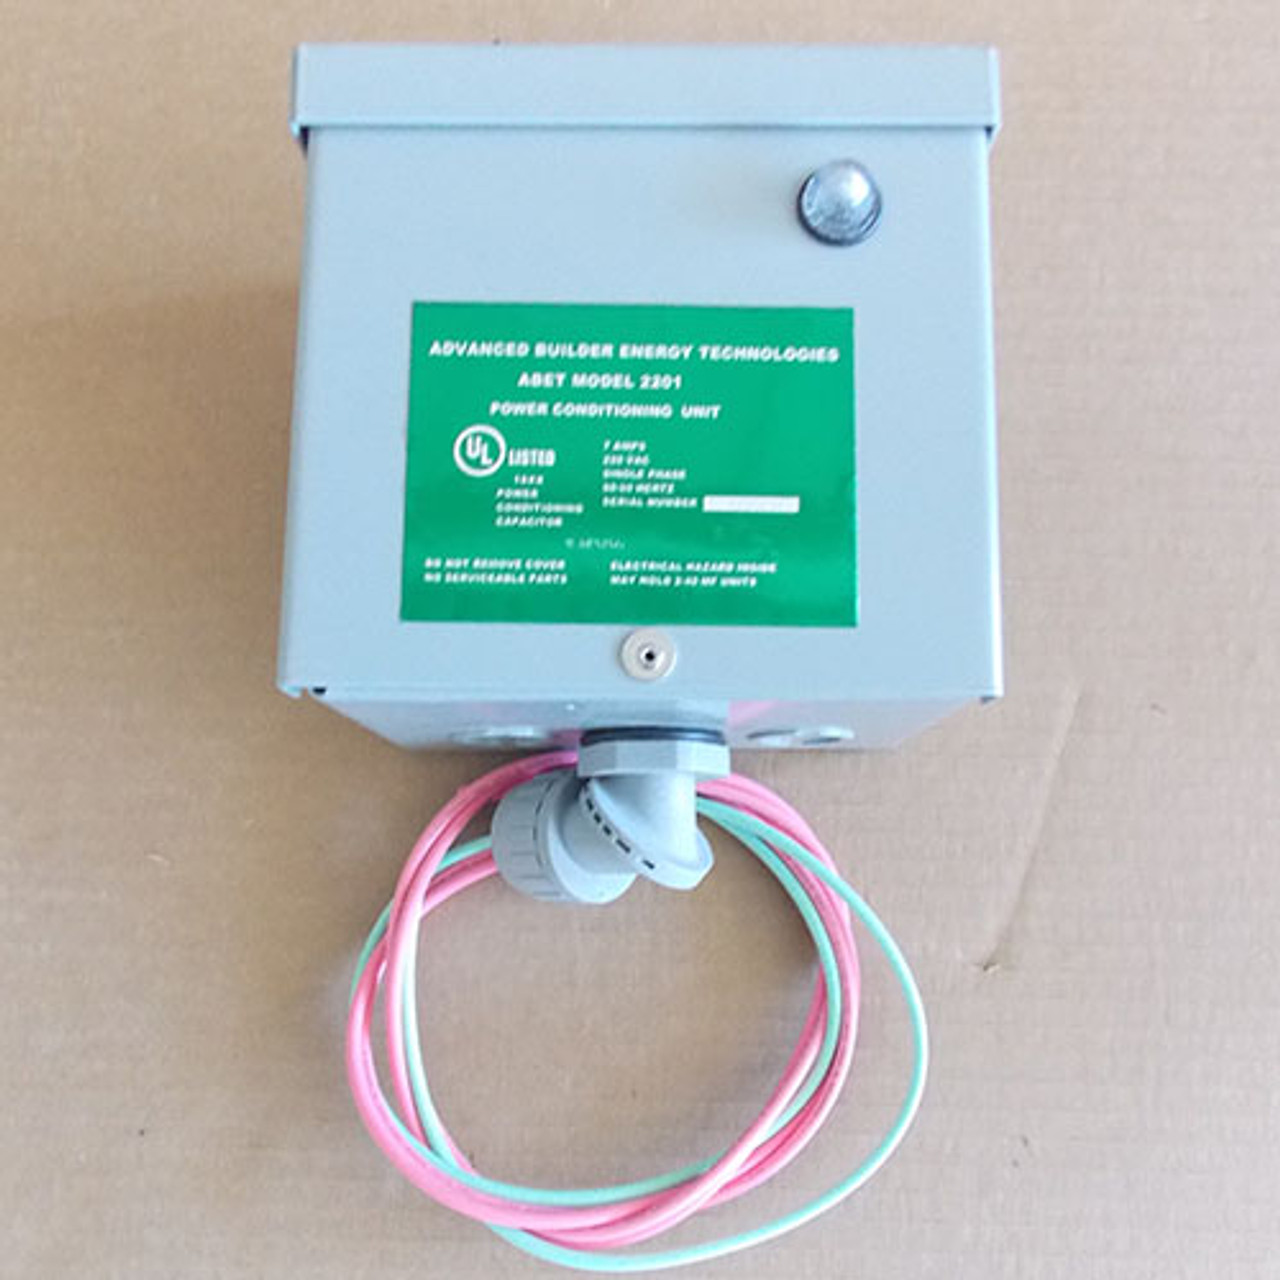 ABET Model 2201 Power Conditioning Capacitor 7 Amp, 220VAC, Single Phase  - New